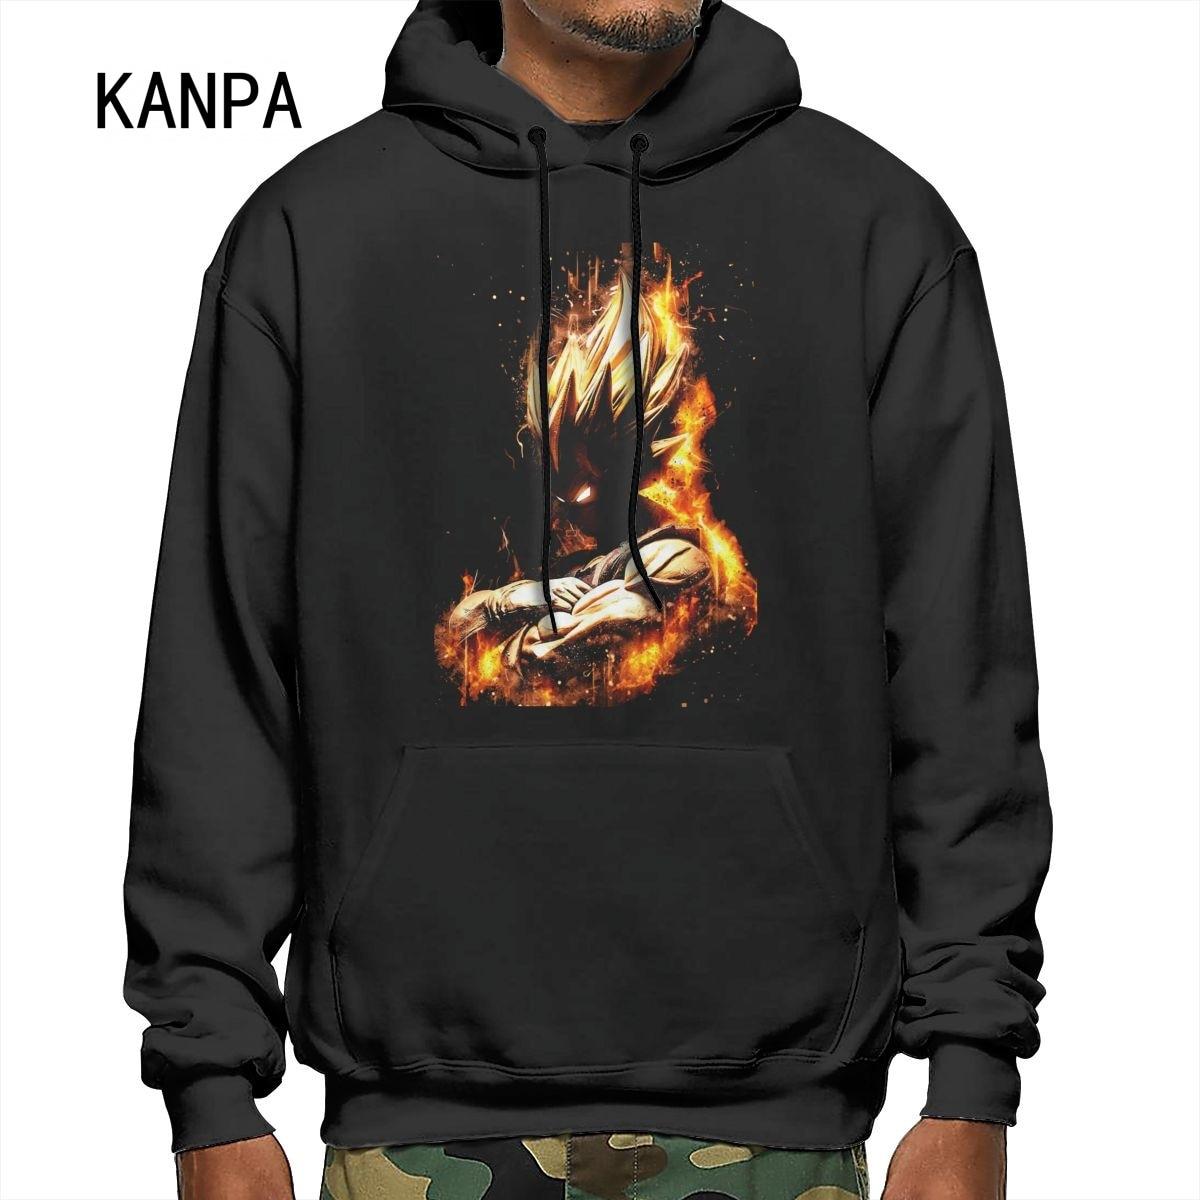 KANPA 2021 New Fashion Brand Men's Hoodies Anime clothes Personality Pattern Print Anime Hoody Men W